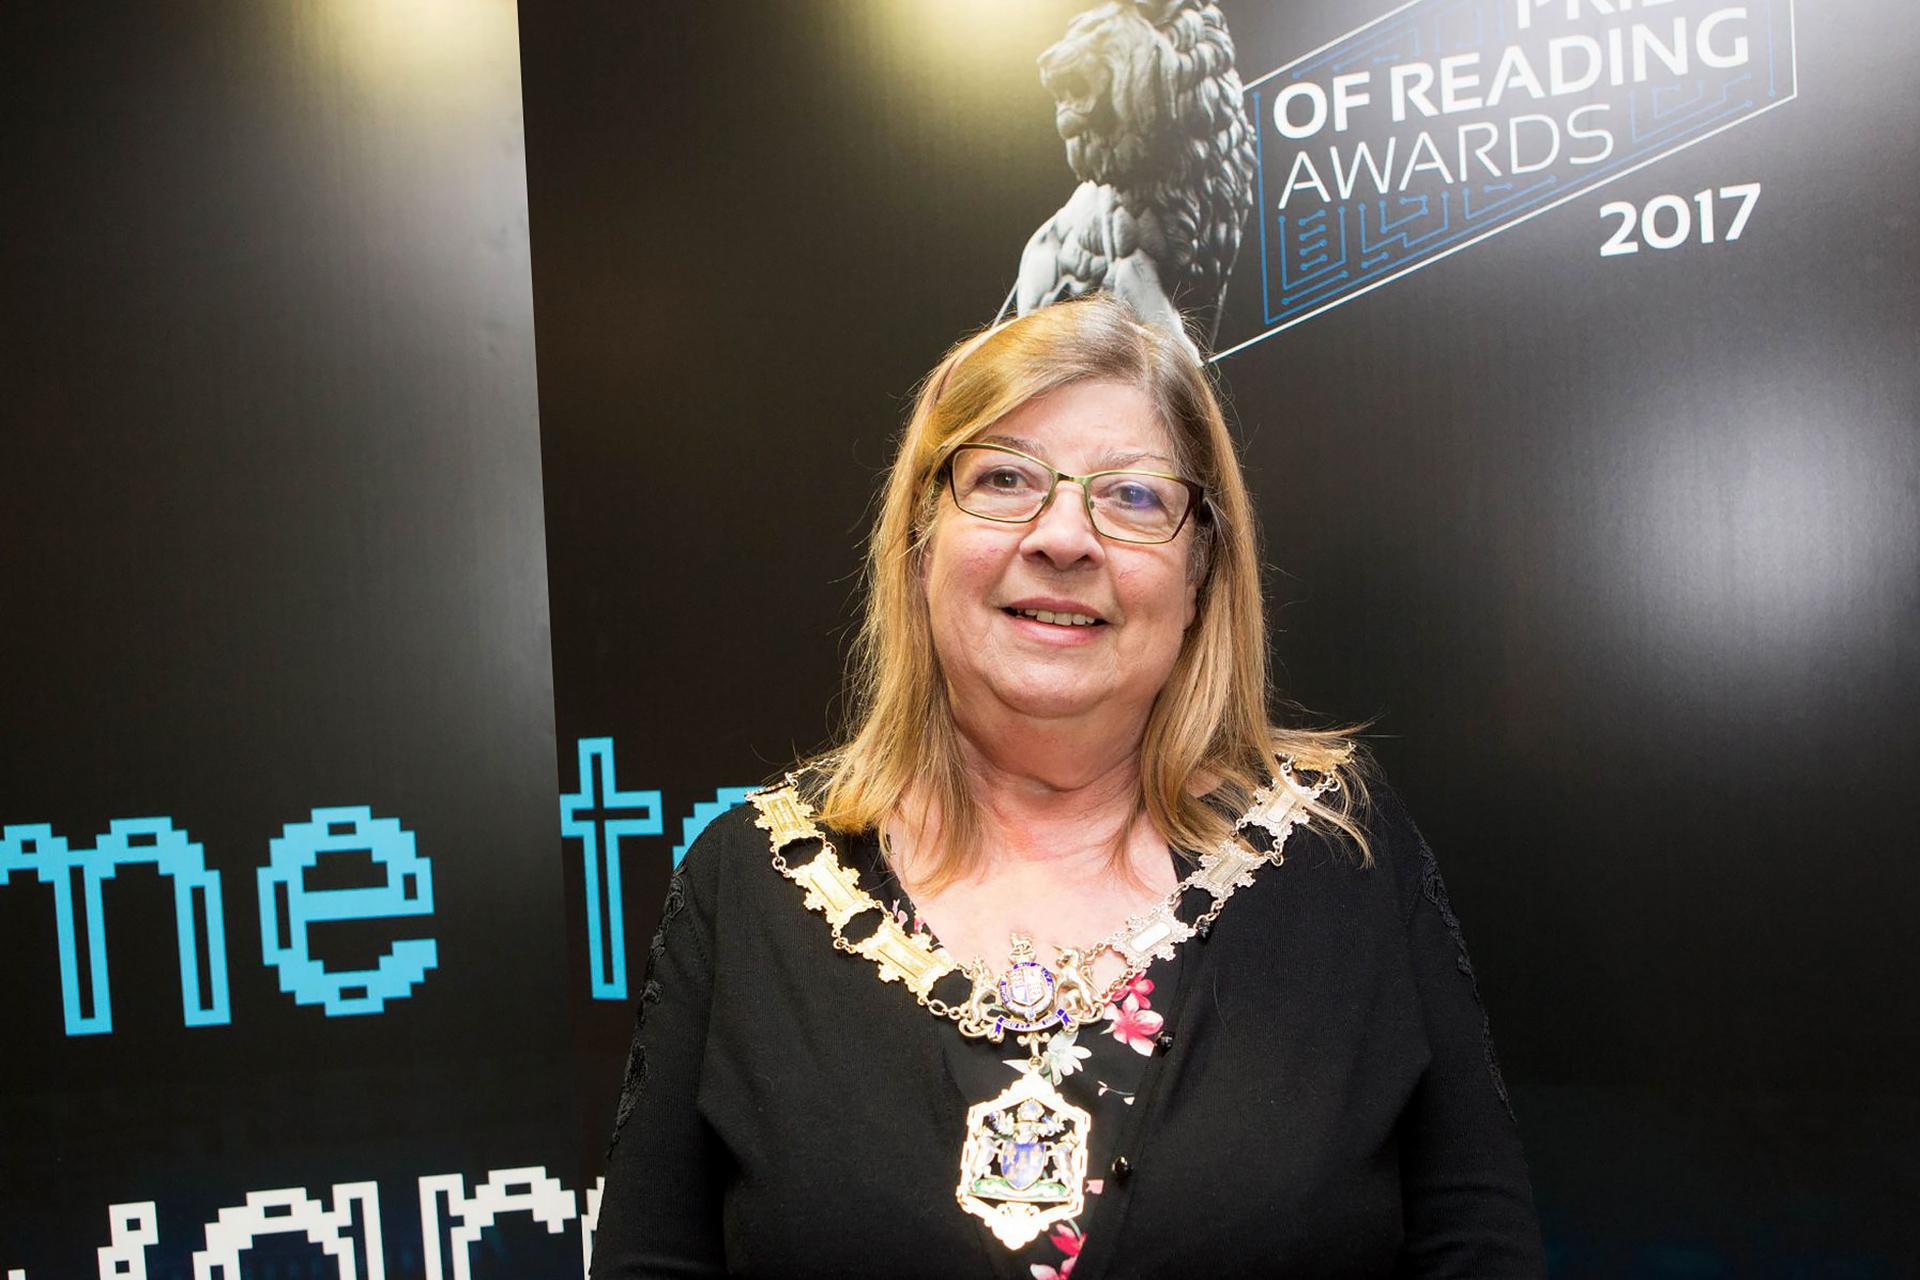 Pride of Reading Awards 2017 Backdrop